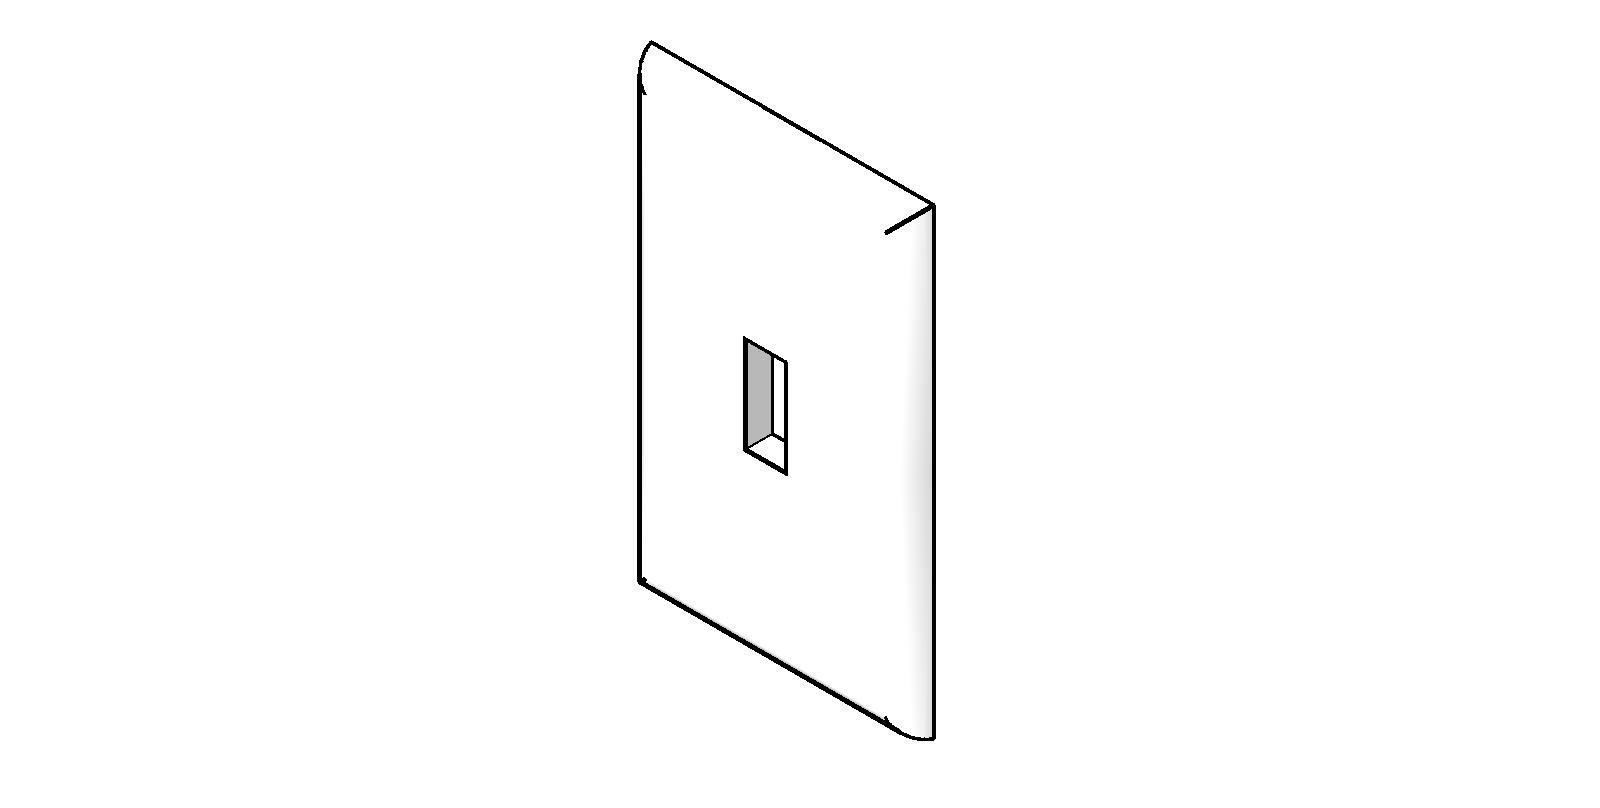 Leviton 5225 Wiring Diagram